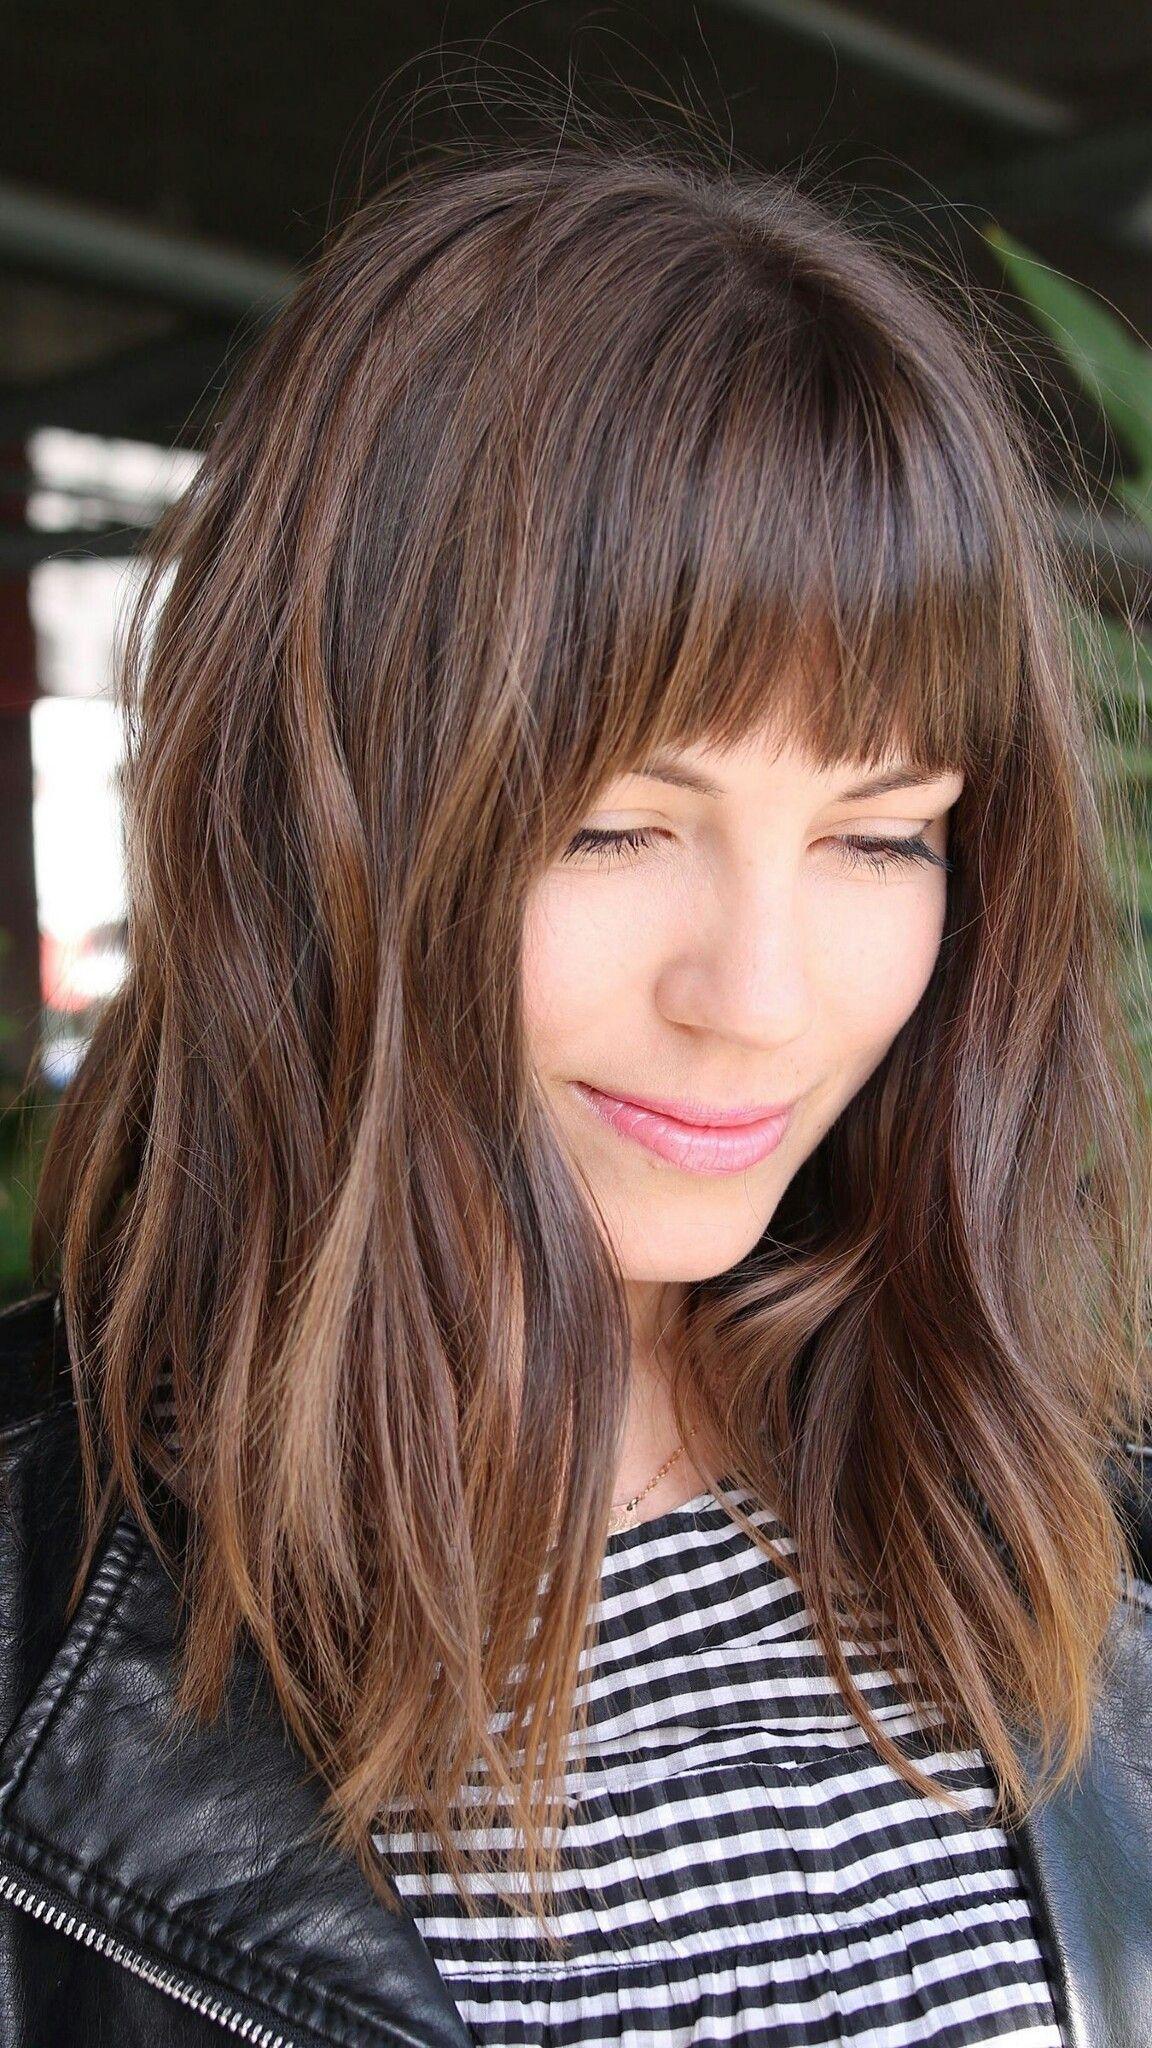 Pin by sephie bruns on hair in pinterest hair hair styles